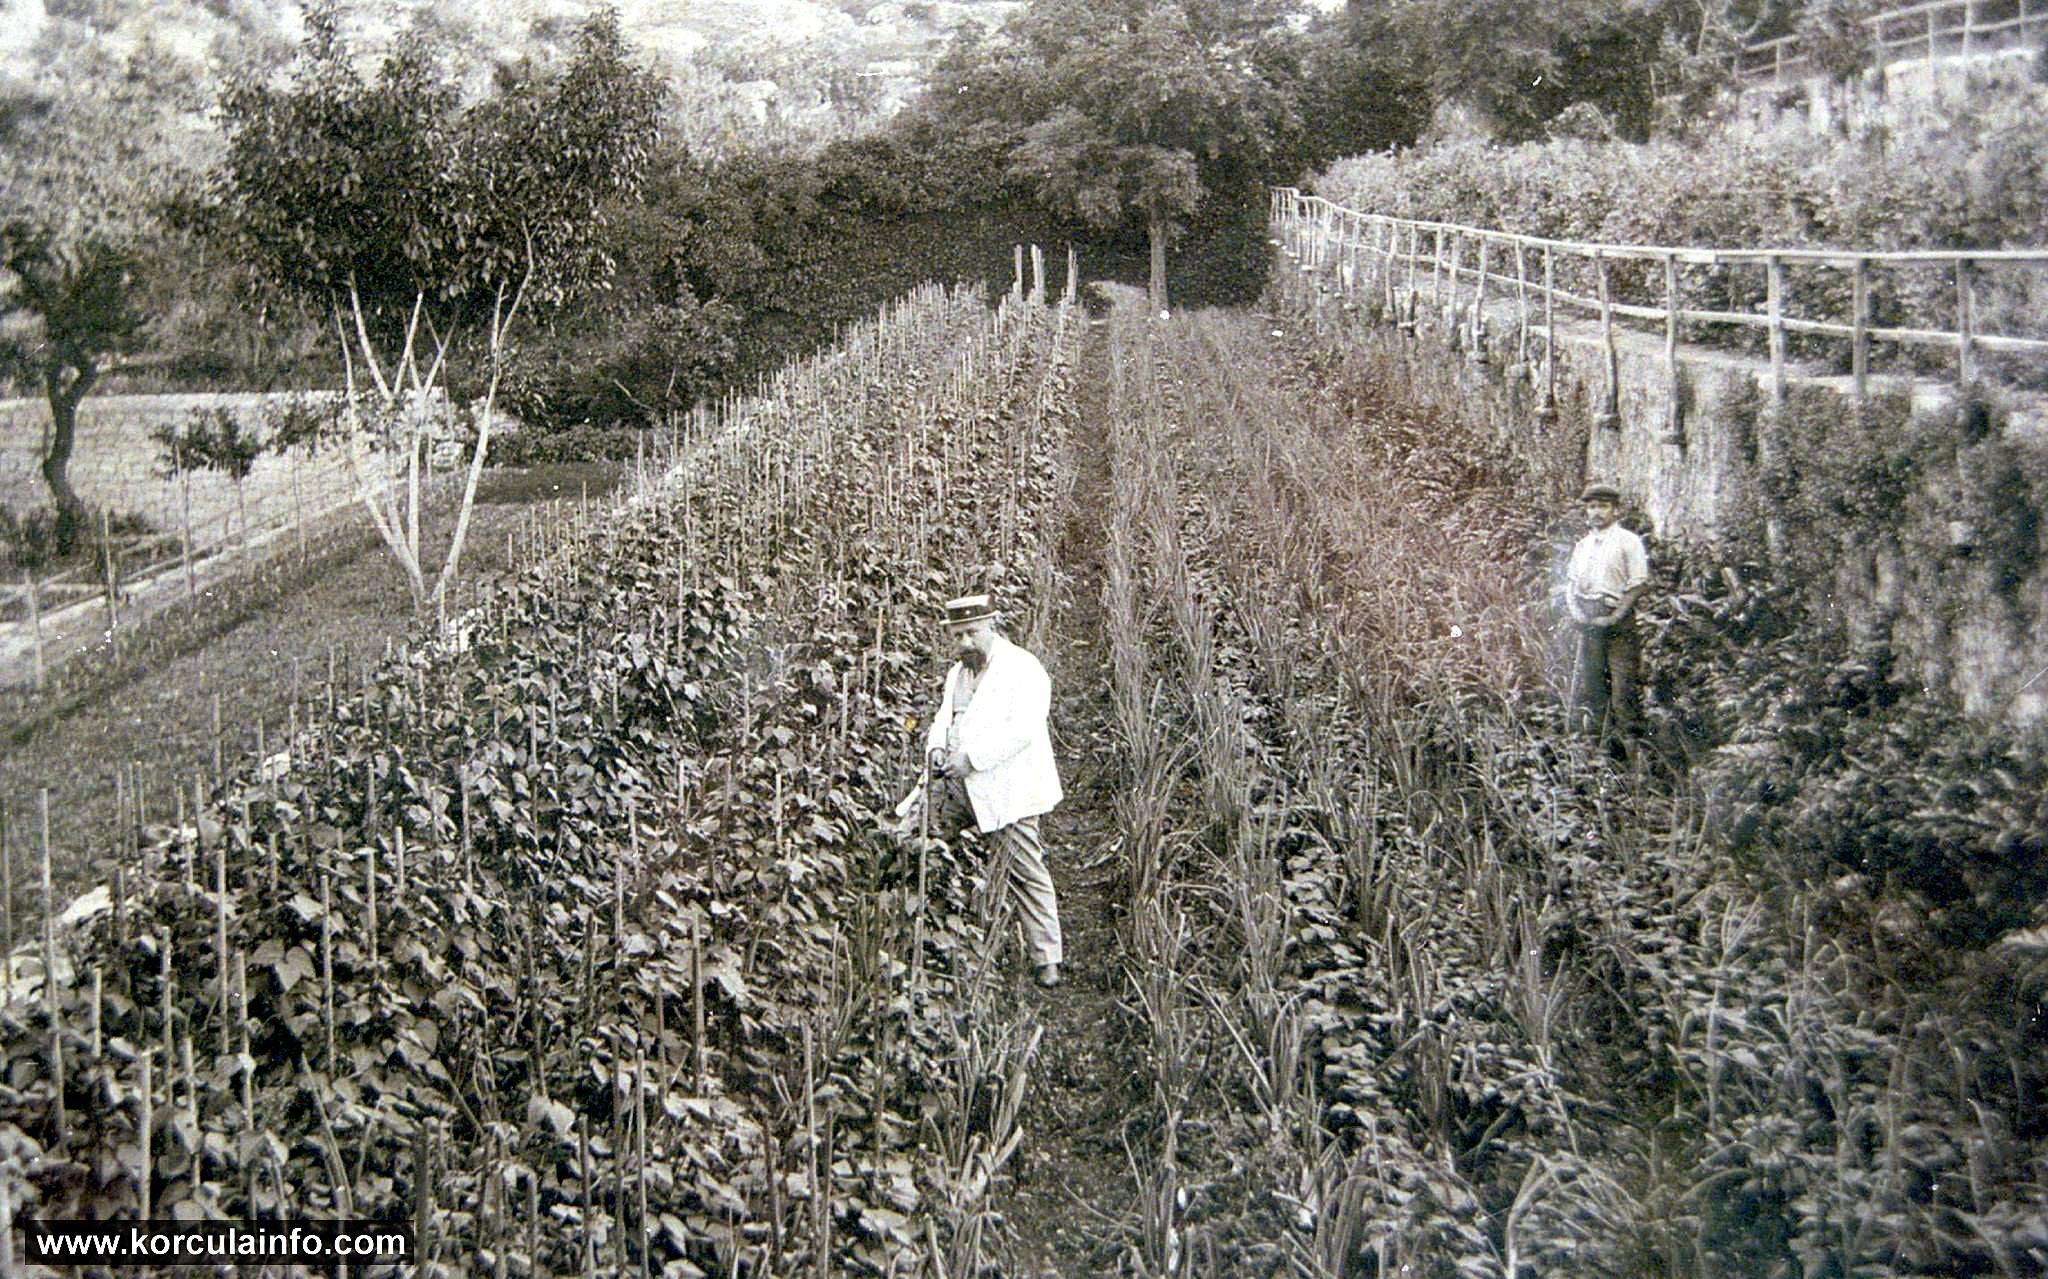 Gardens Foretic in Korcula (1920s)